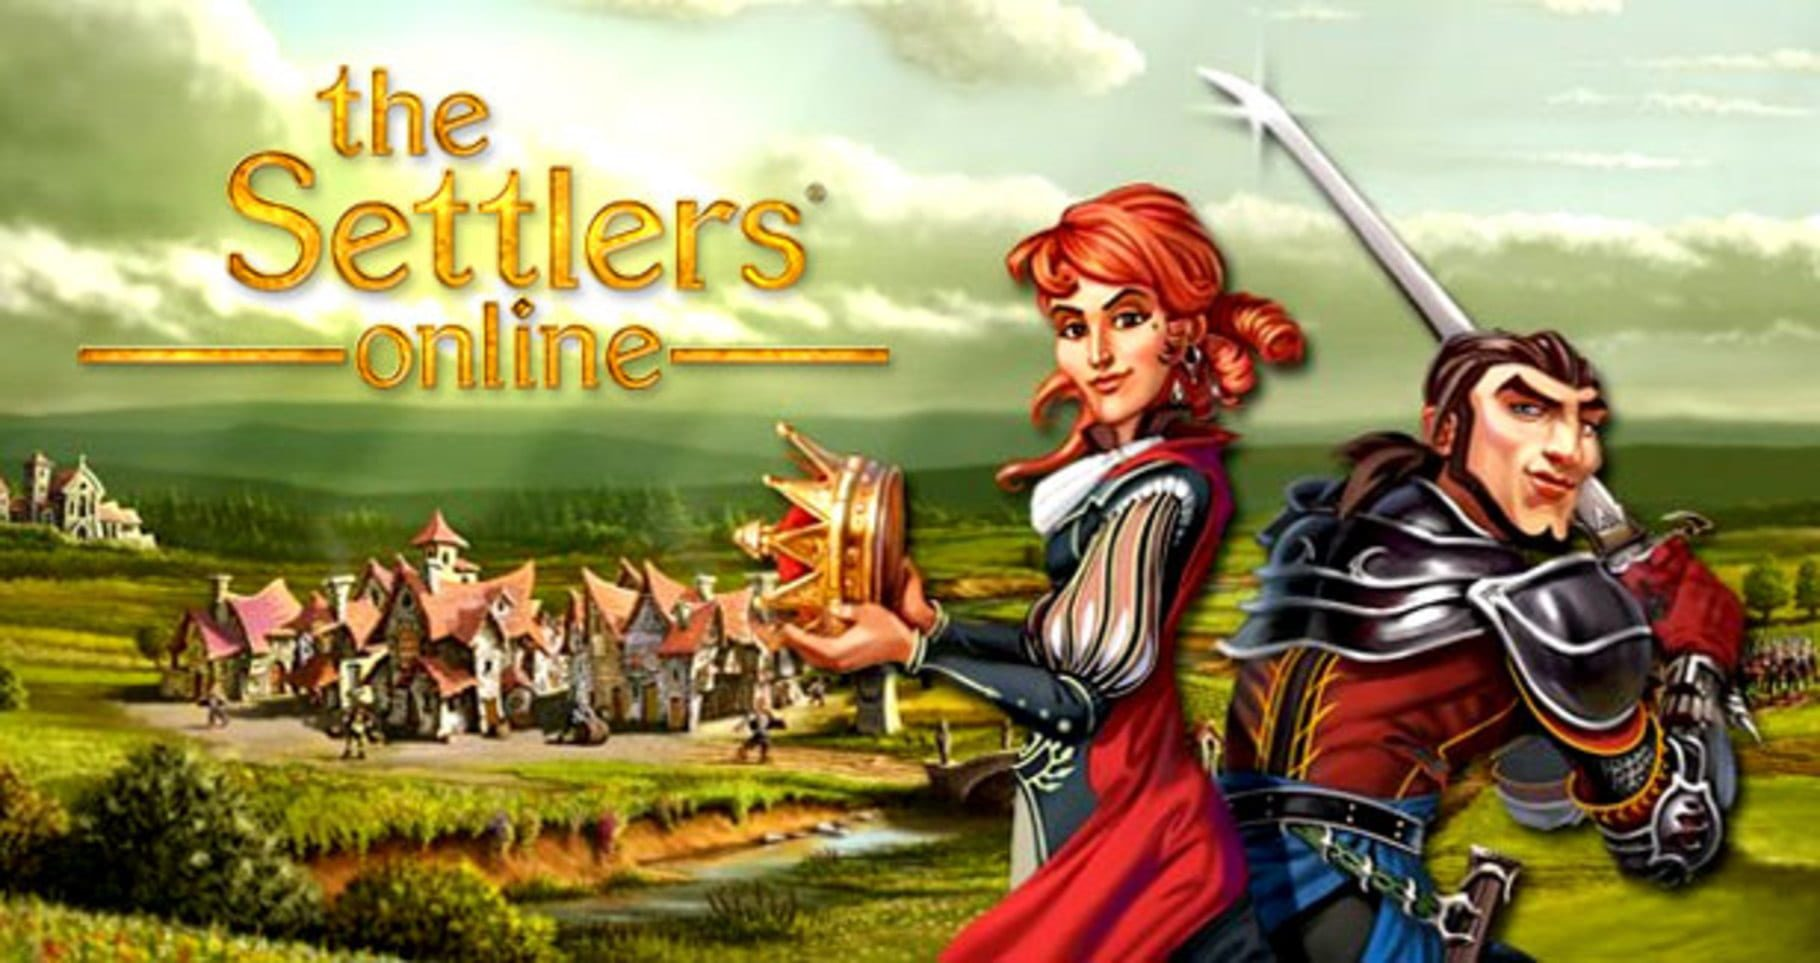 buy The Settlers Online cd key for all platform